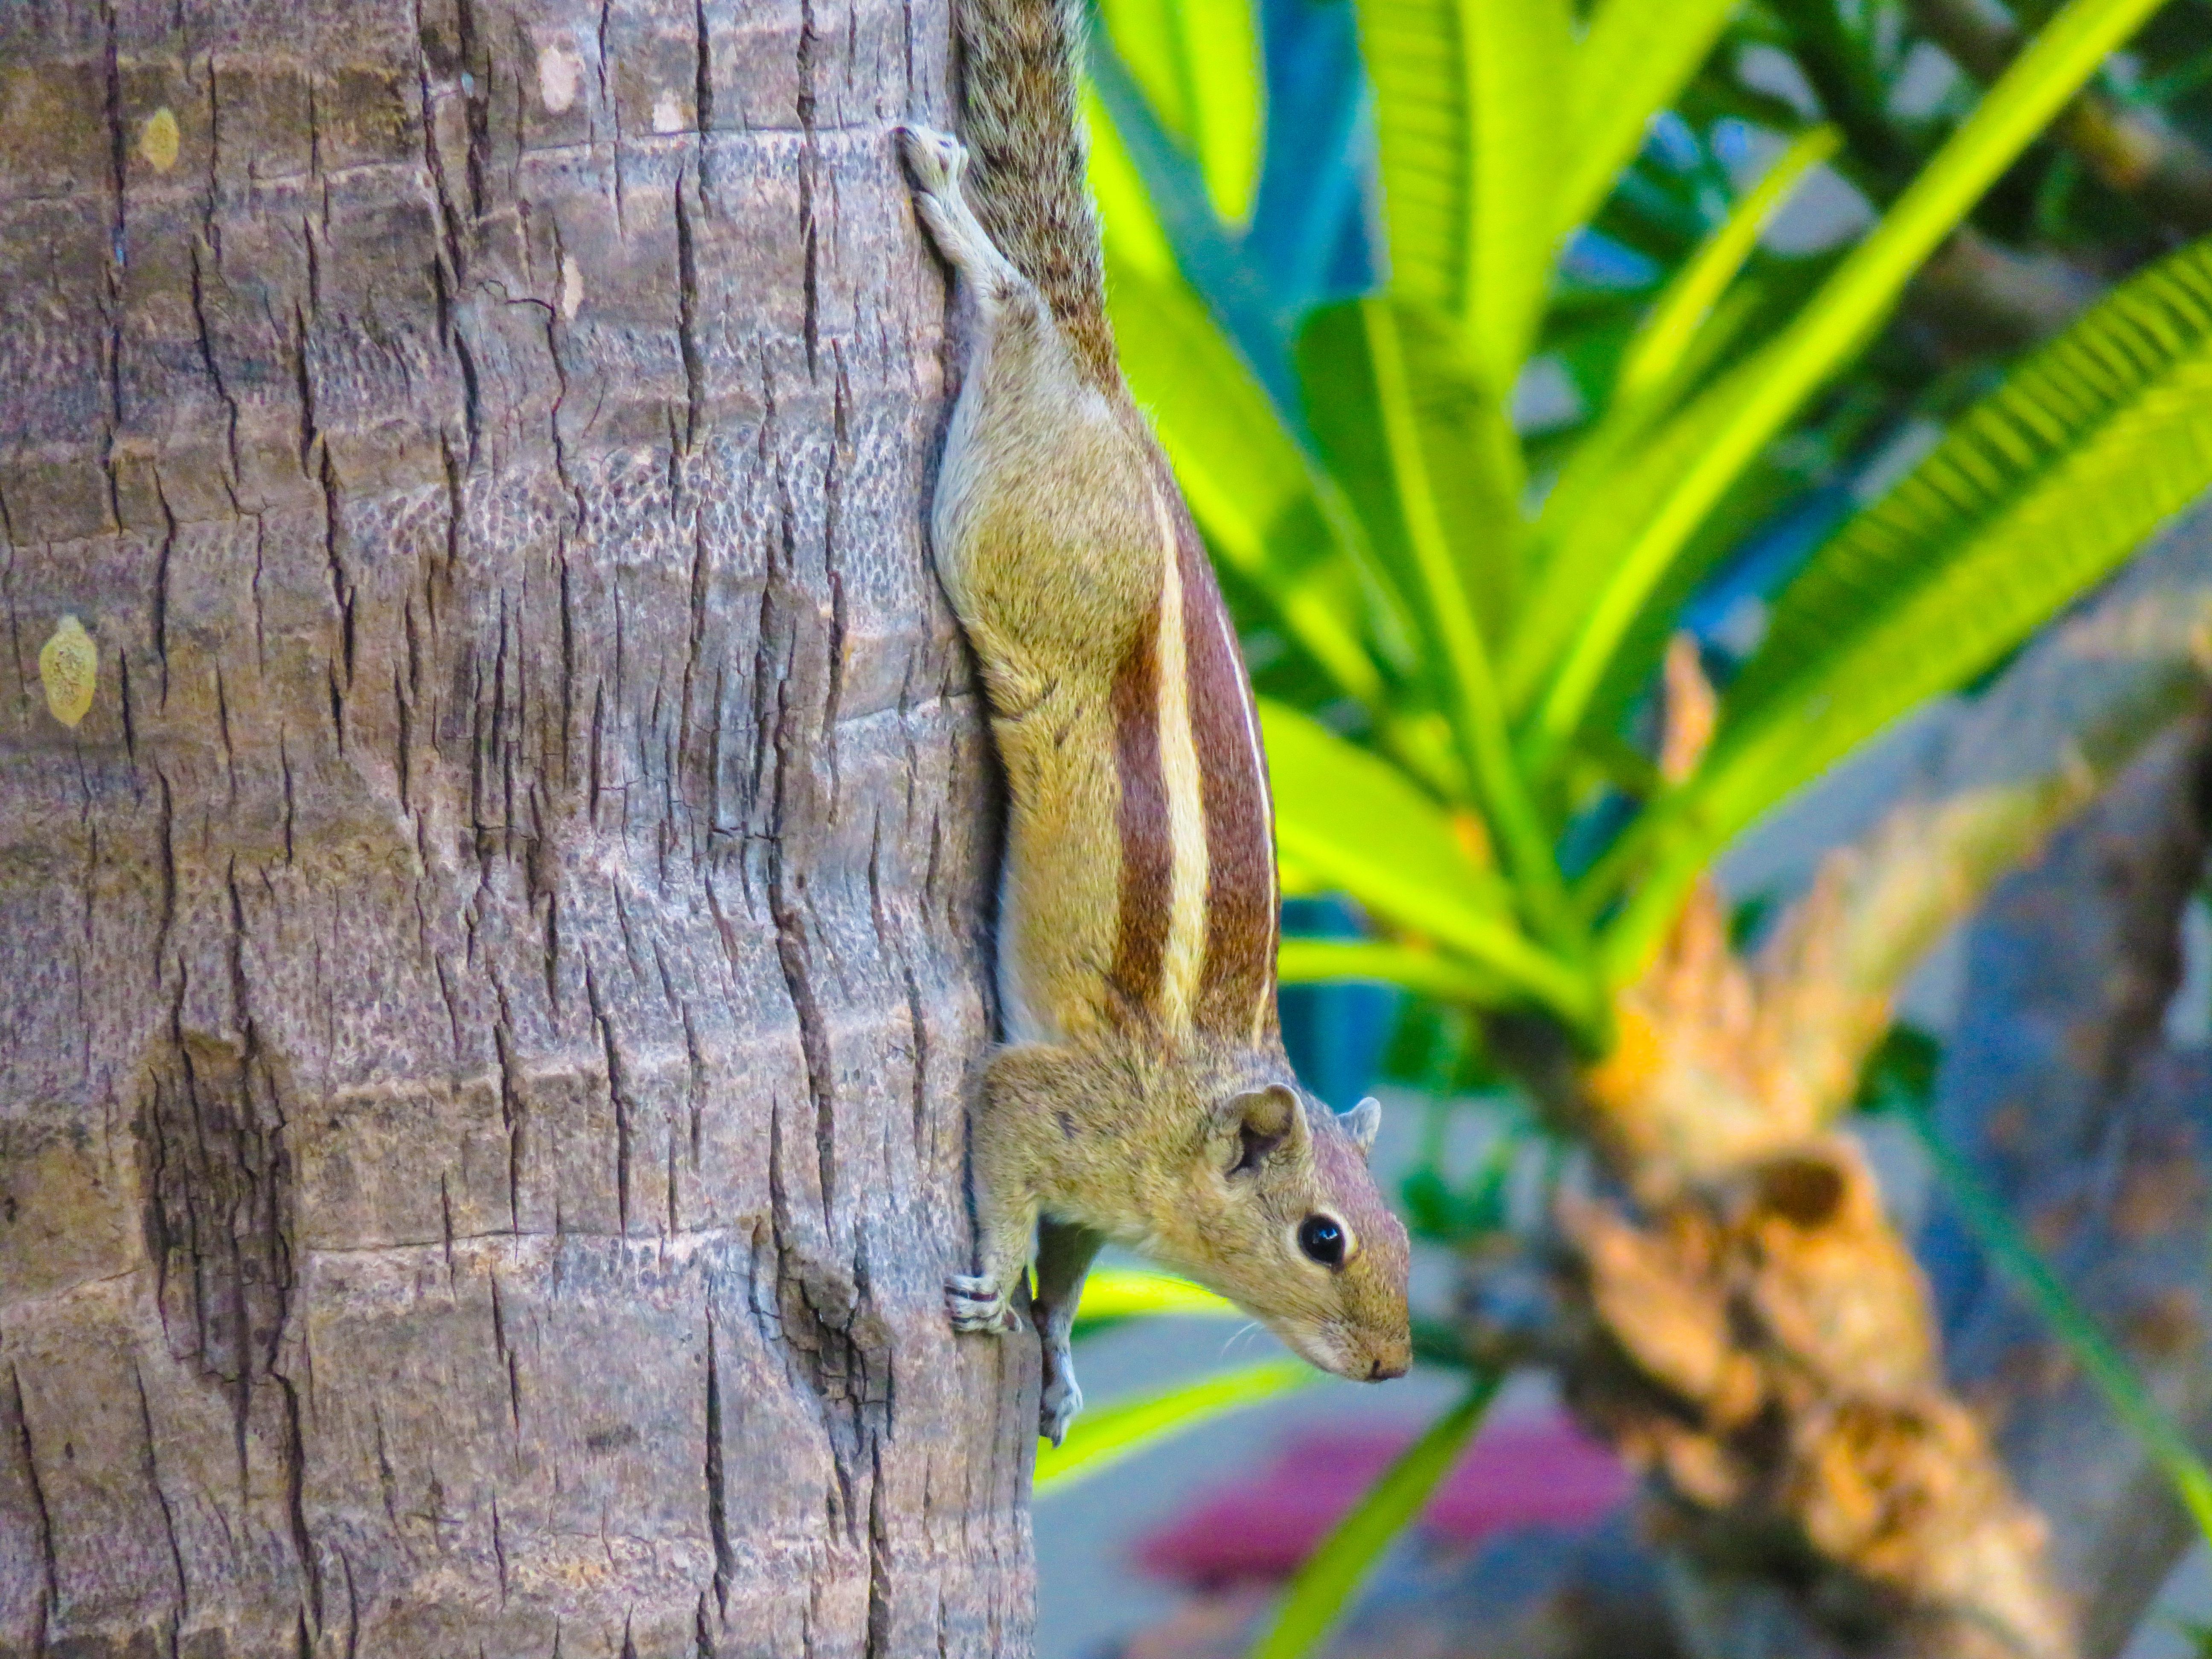 Squirrel Encounter, Squirrel, Tree, Plants, Climbing, HQ Photo